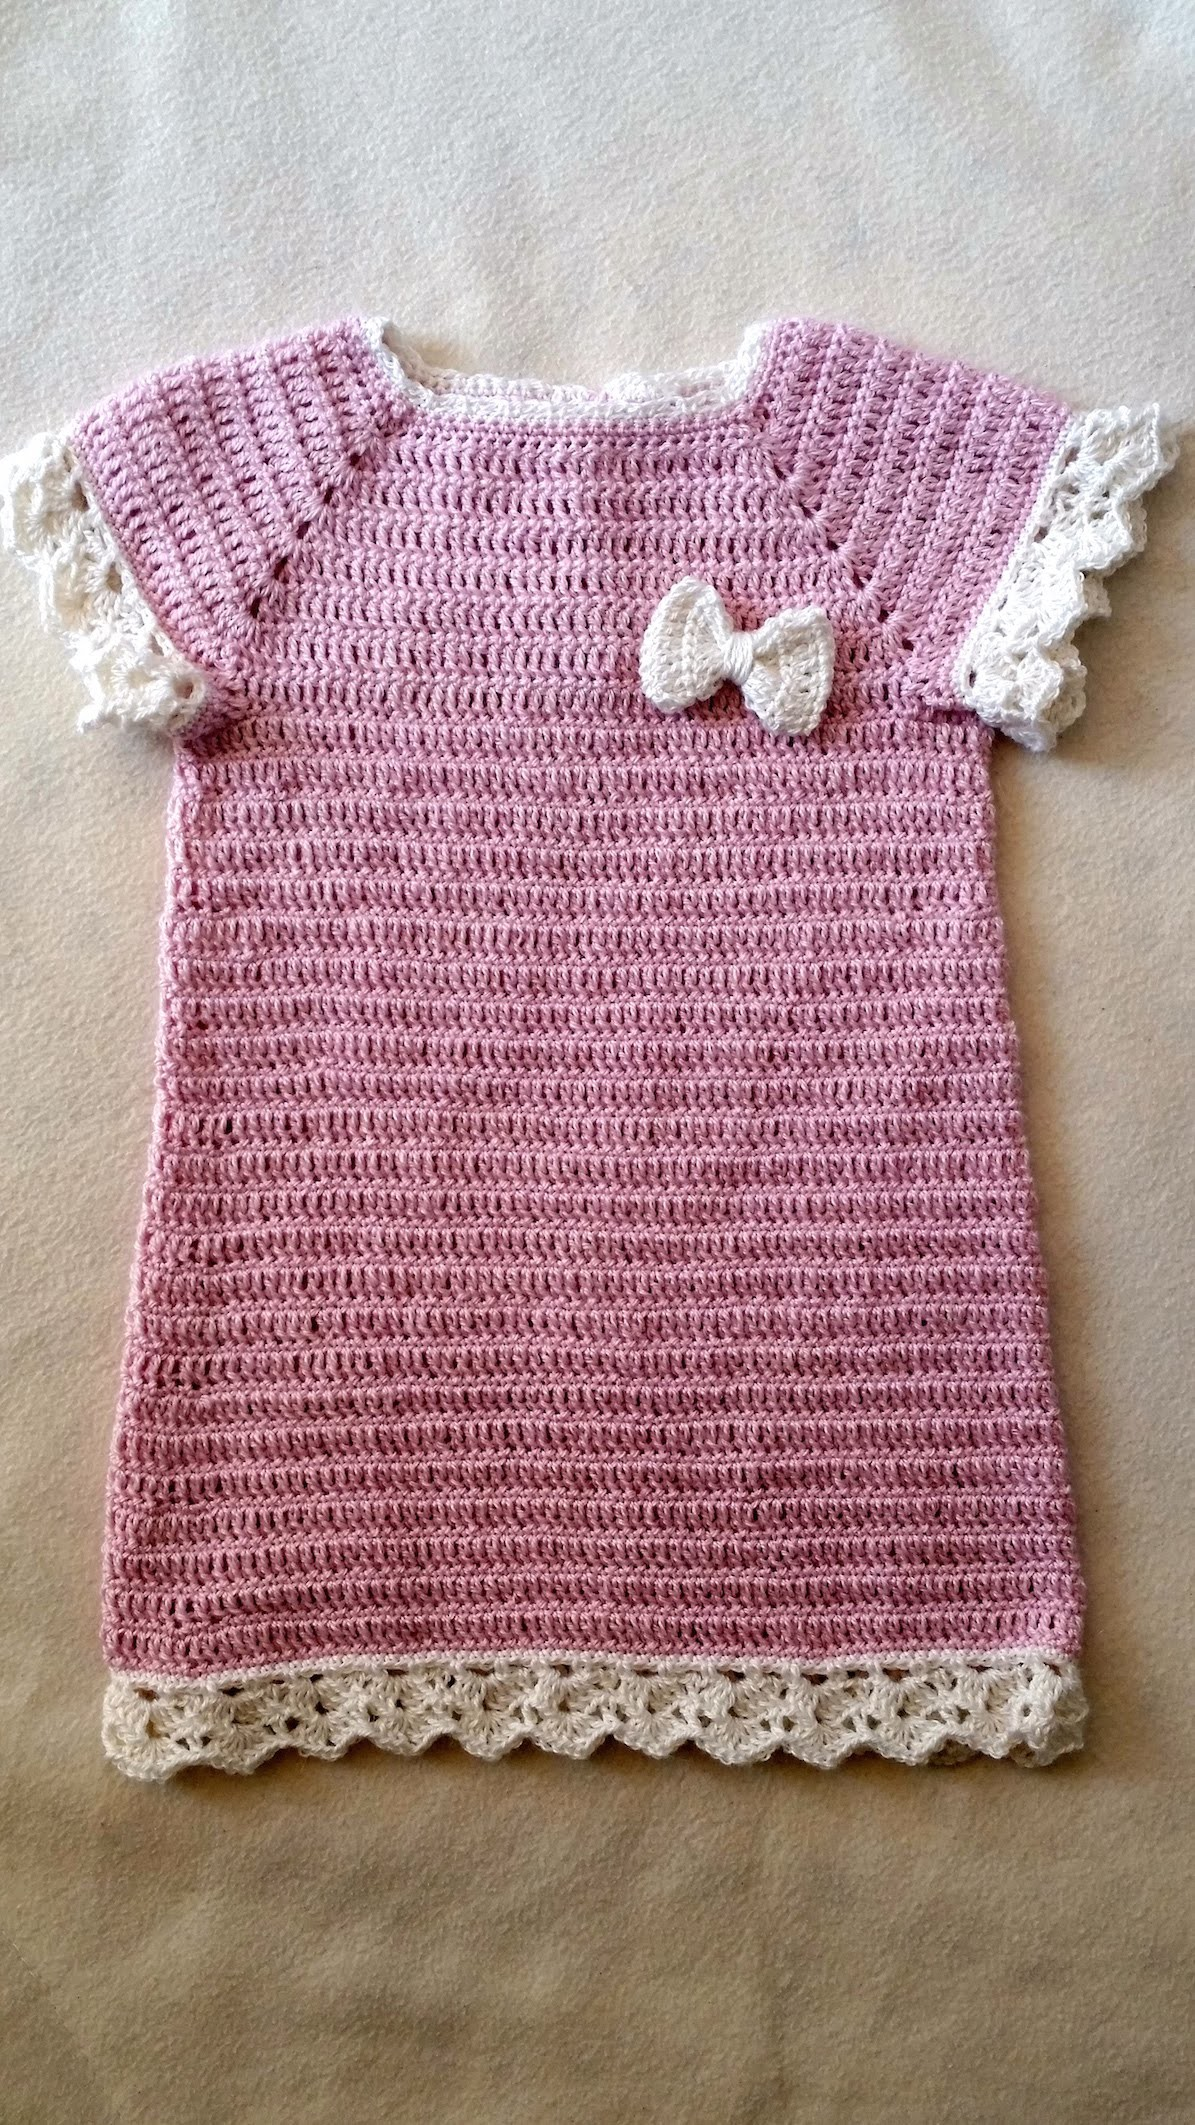 Taufkleid häkeln - Häkelkleid - Babykleid Teil 1. 6 by Berlin Crochet